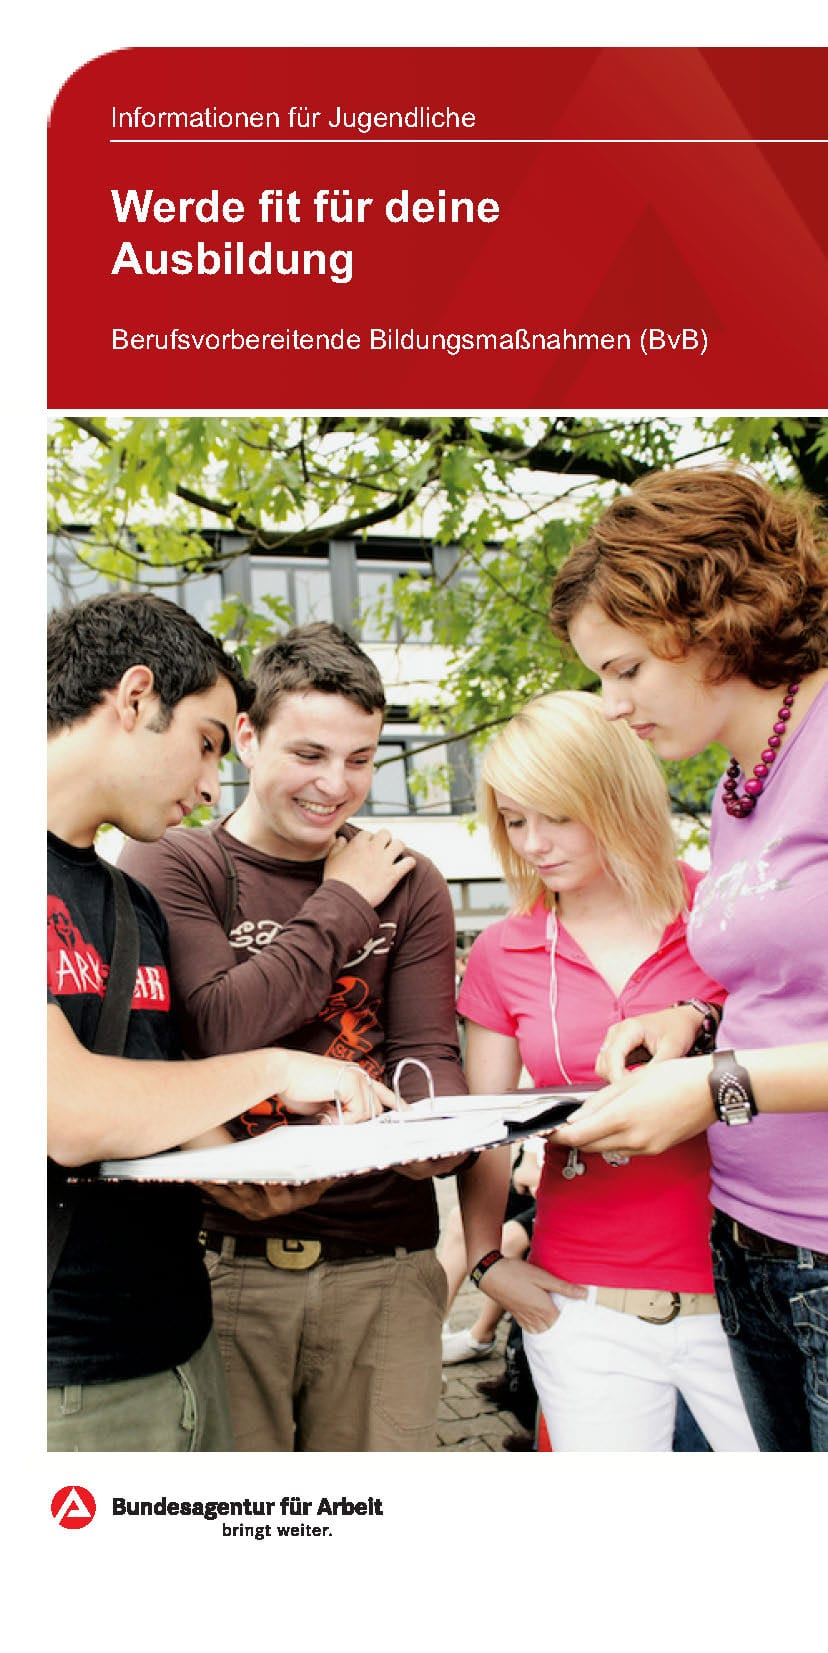 BvB Berufsvorbereitende Bildungsmaßnahmen Titelbild Flyer